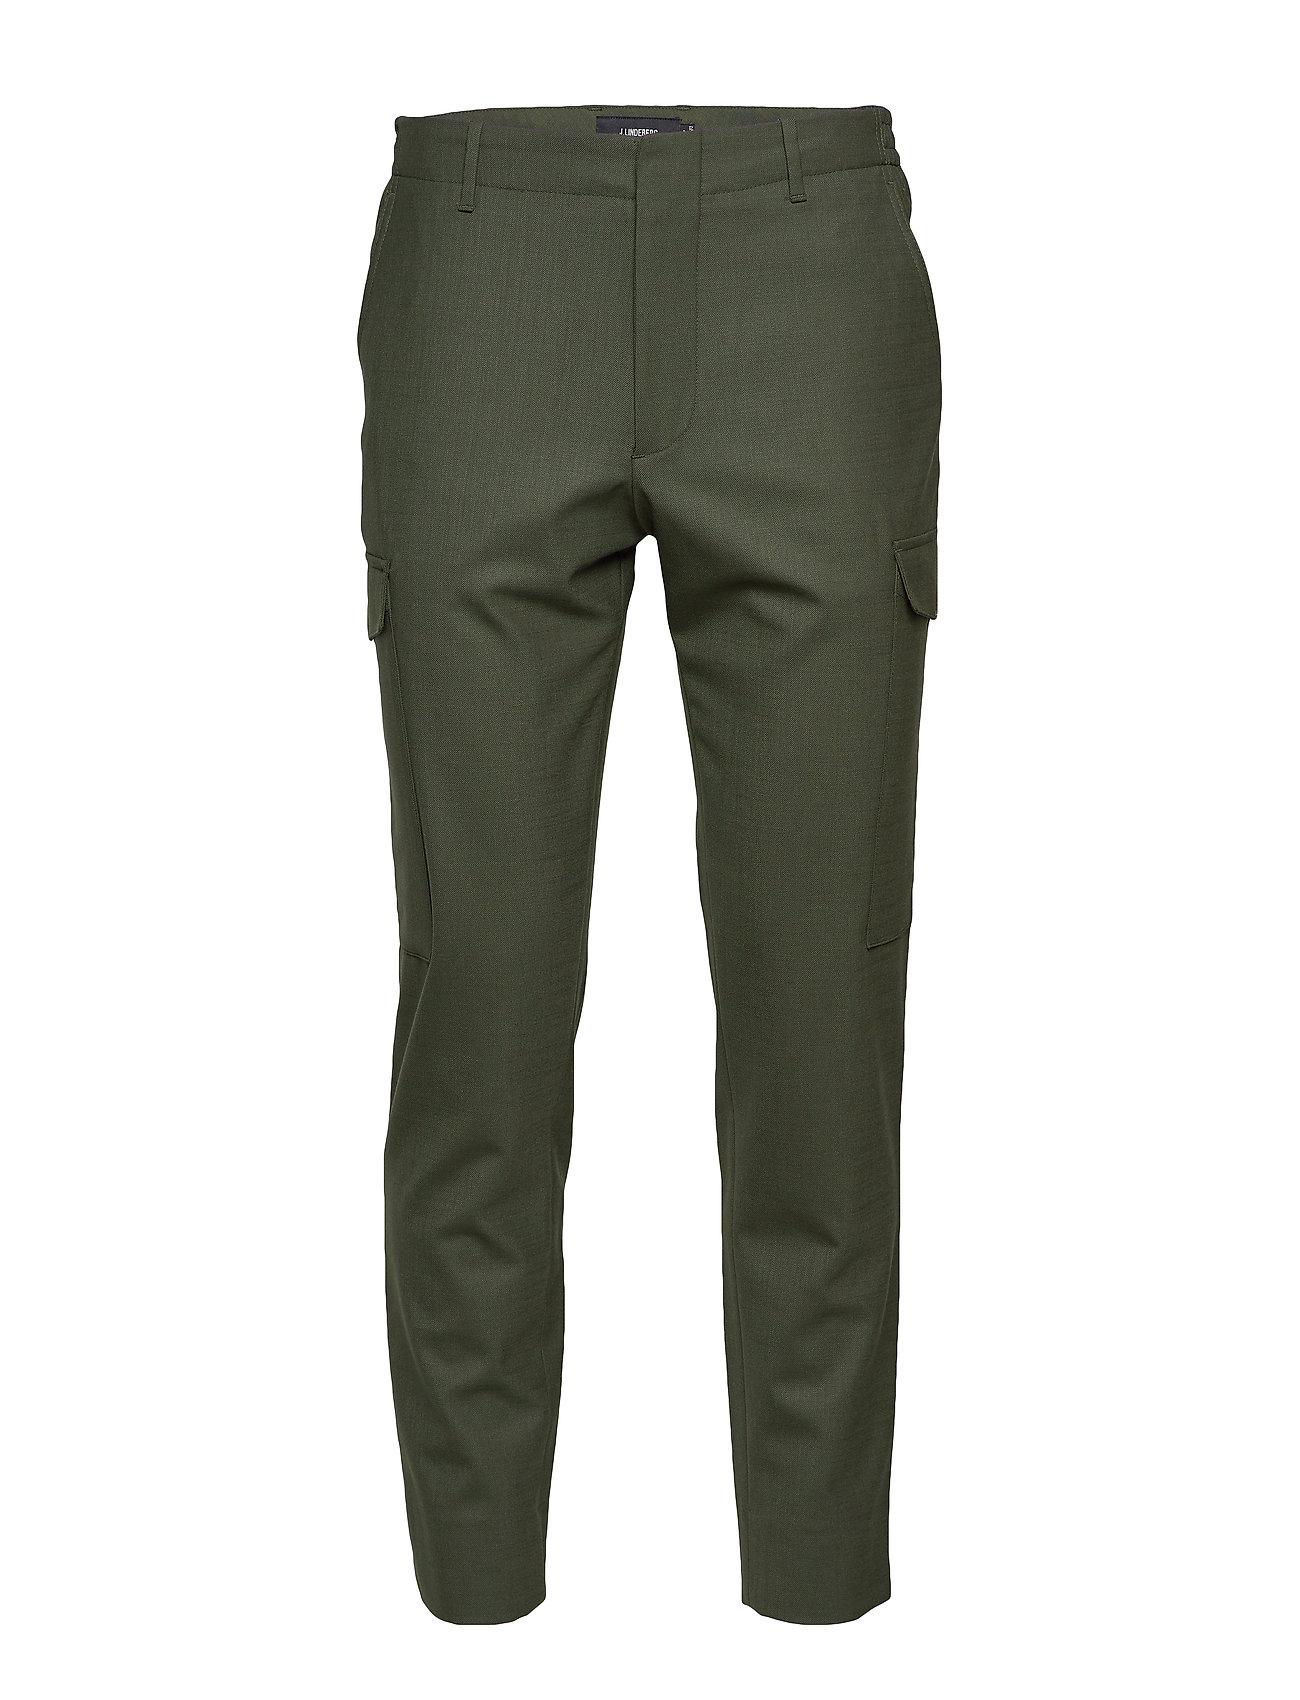 Image of Sasha Cargo-Active Wool Trousers Cargo Pants Grøn J. Lindeberg (3351889737)